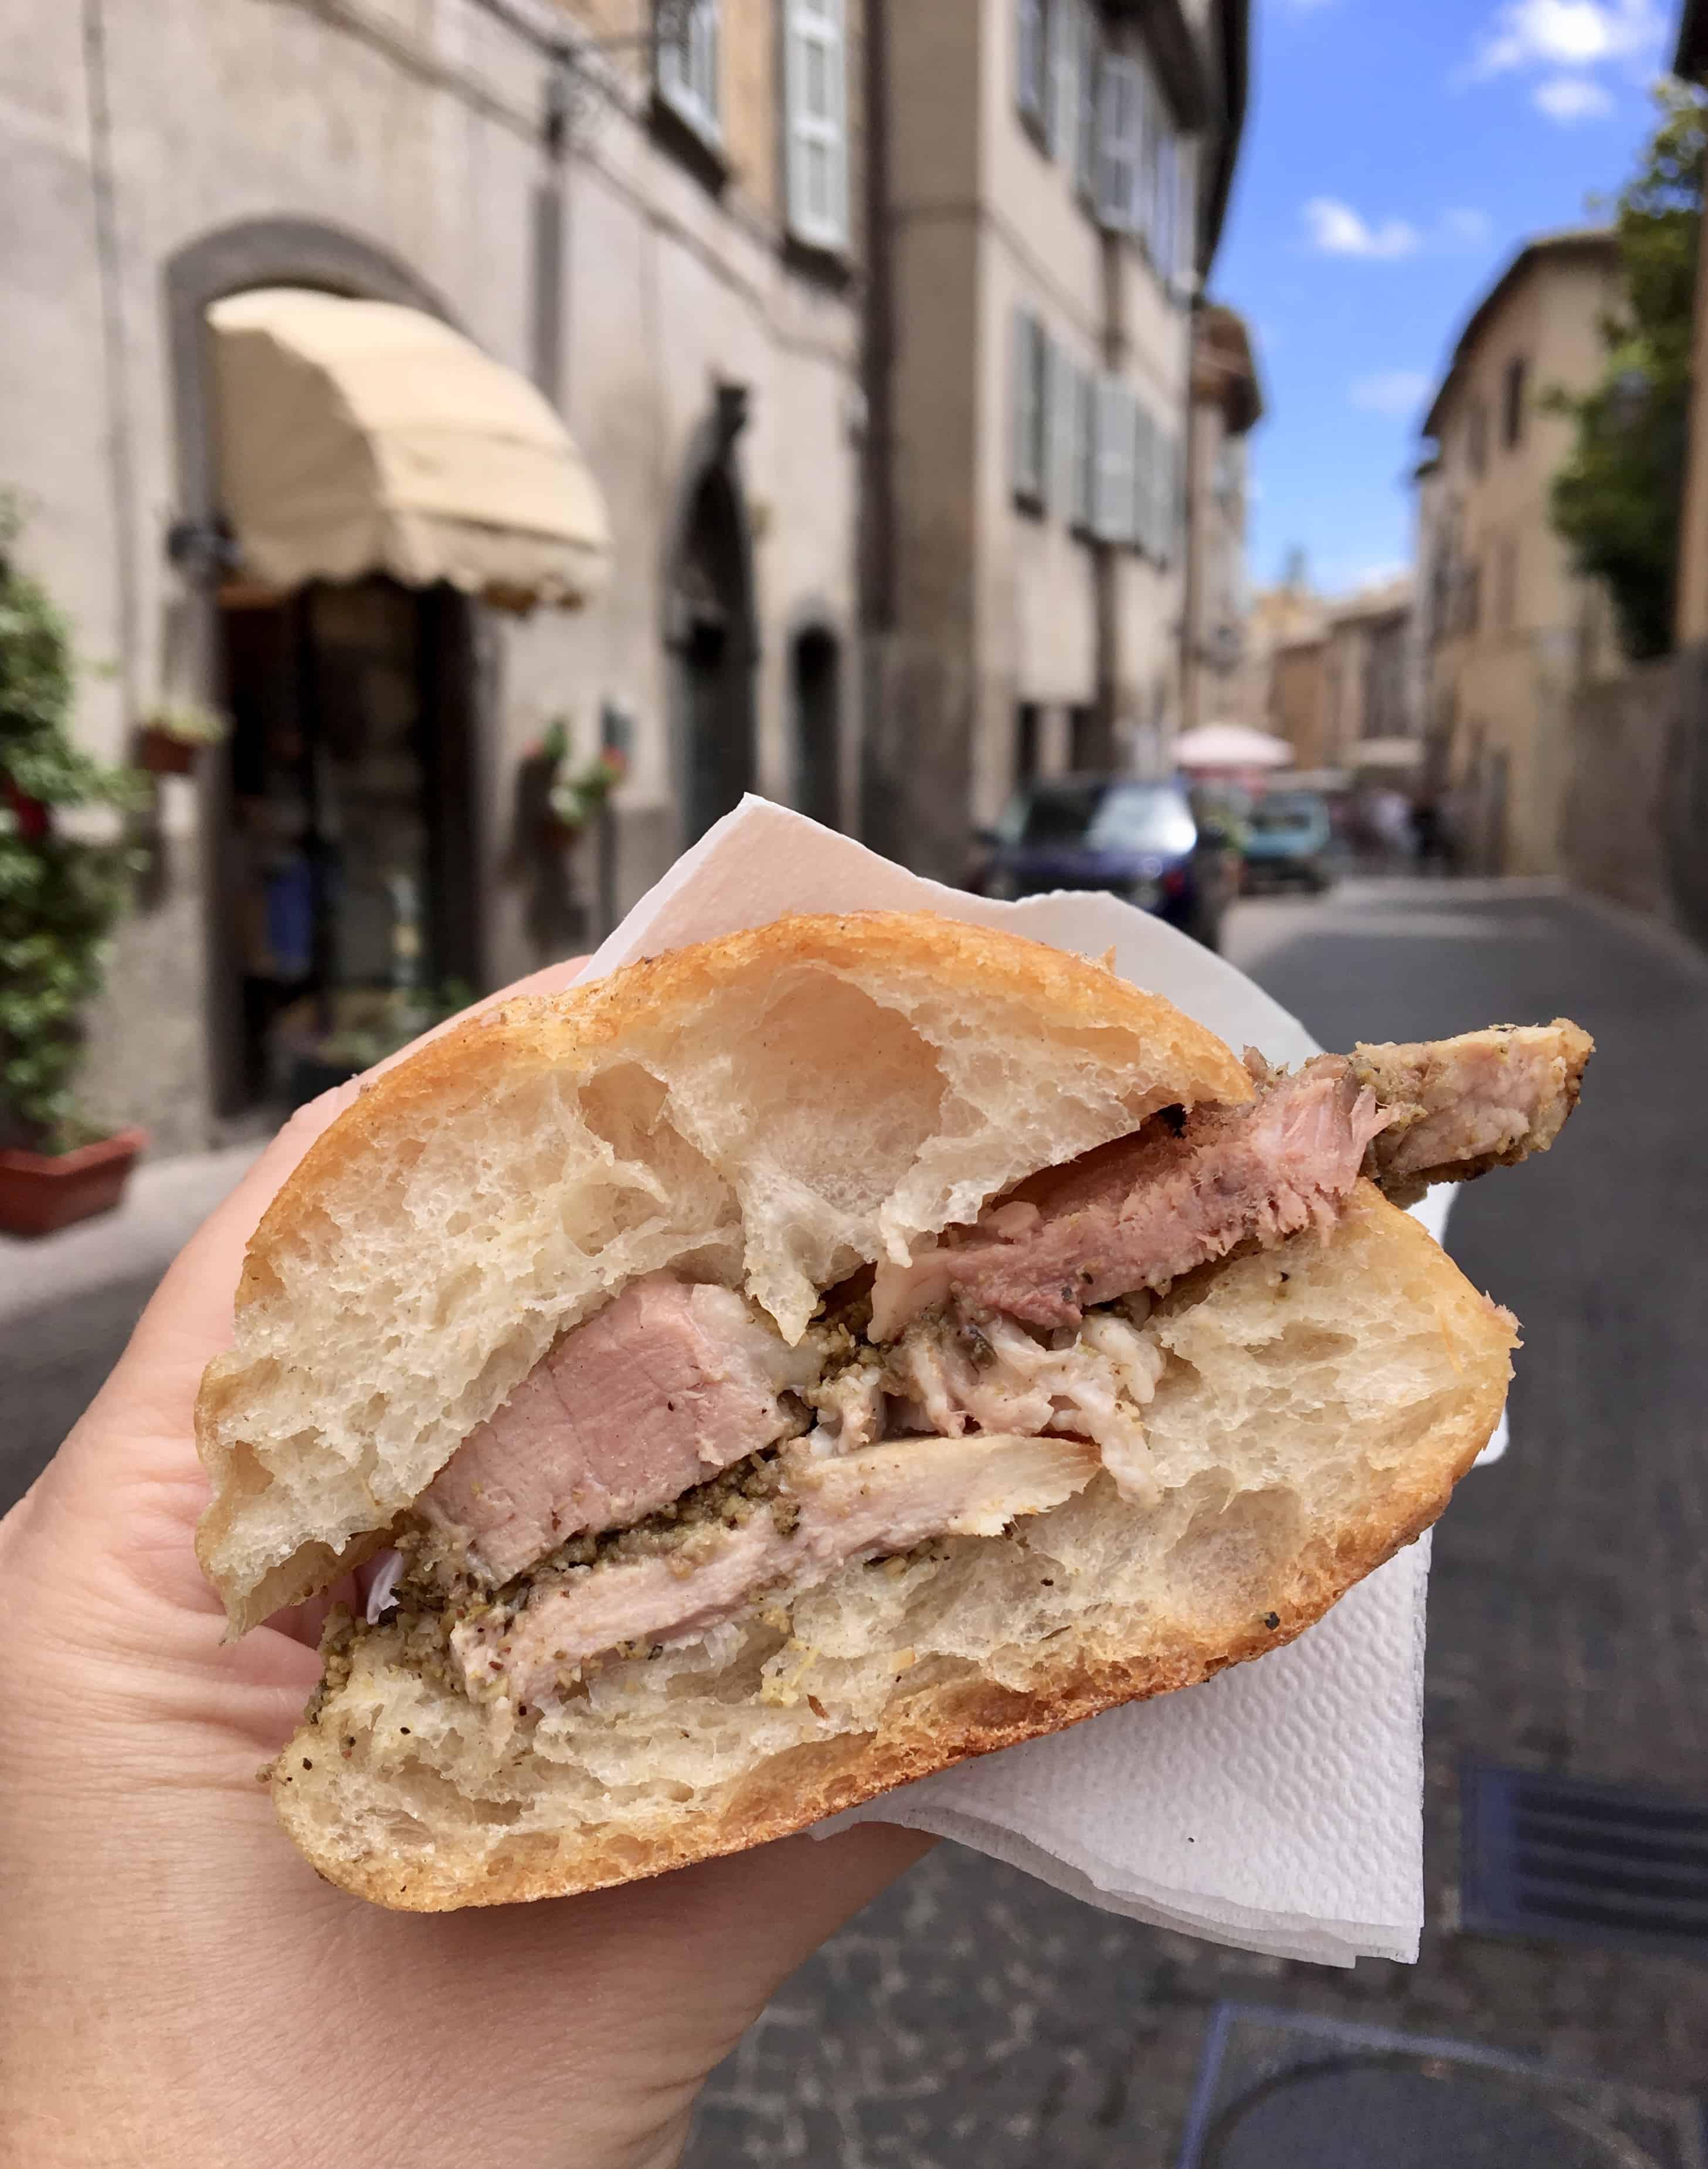 Porchetta panino in Orvieto